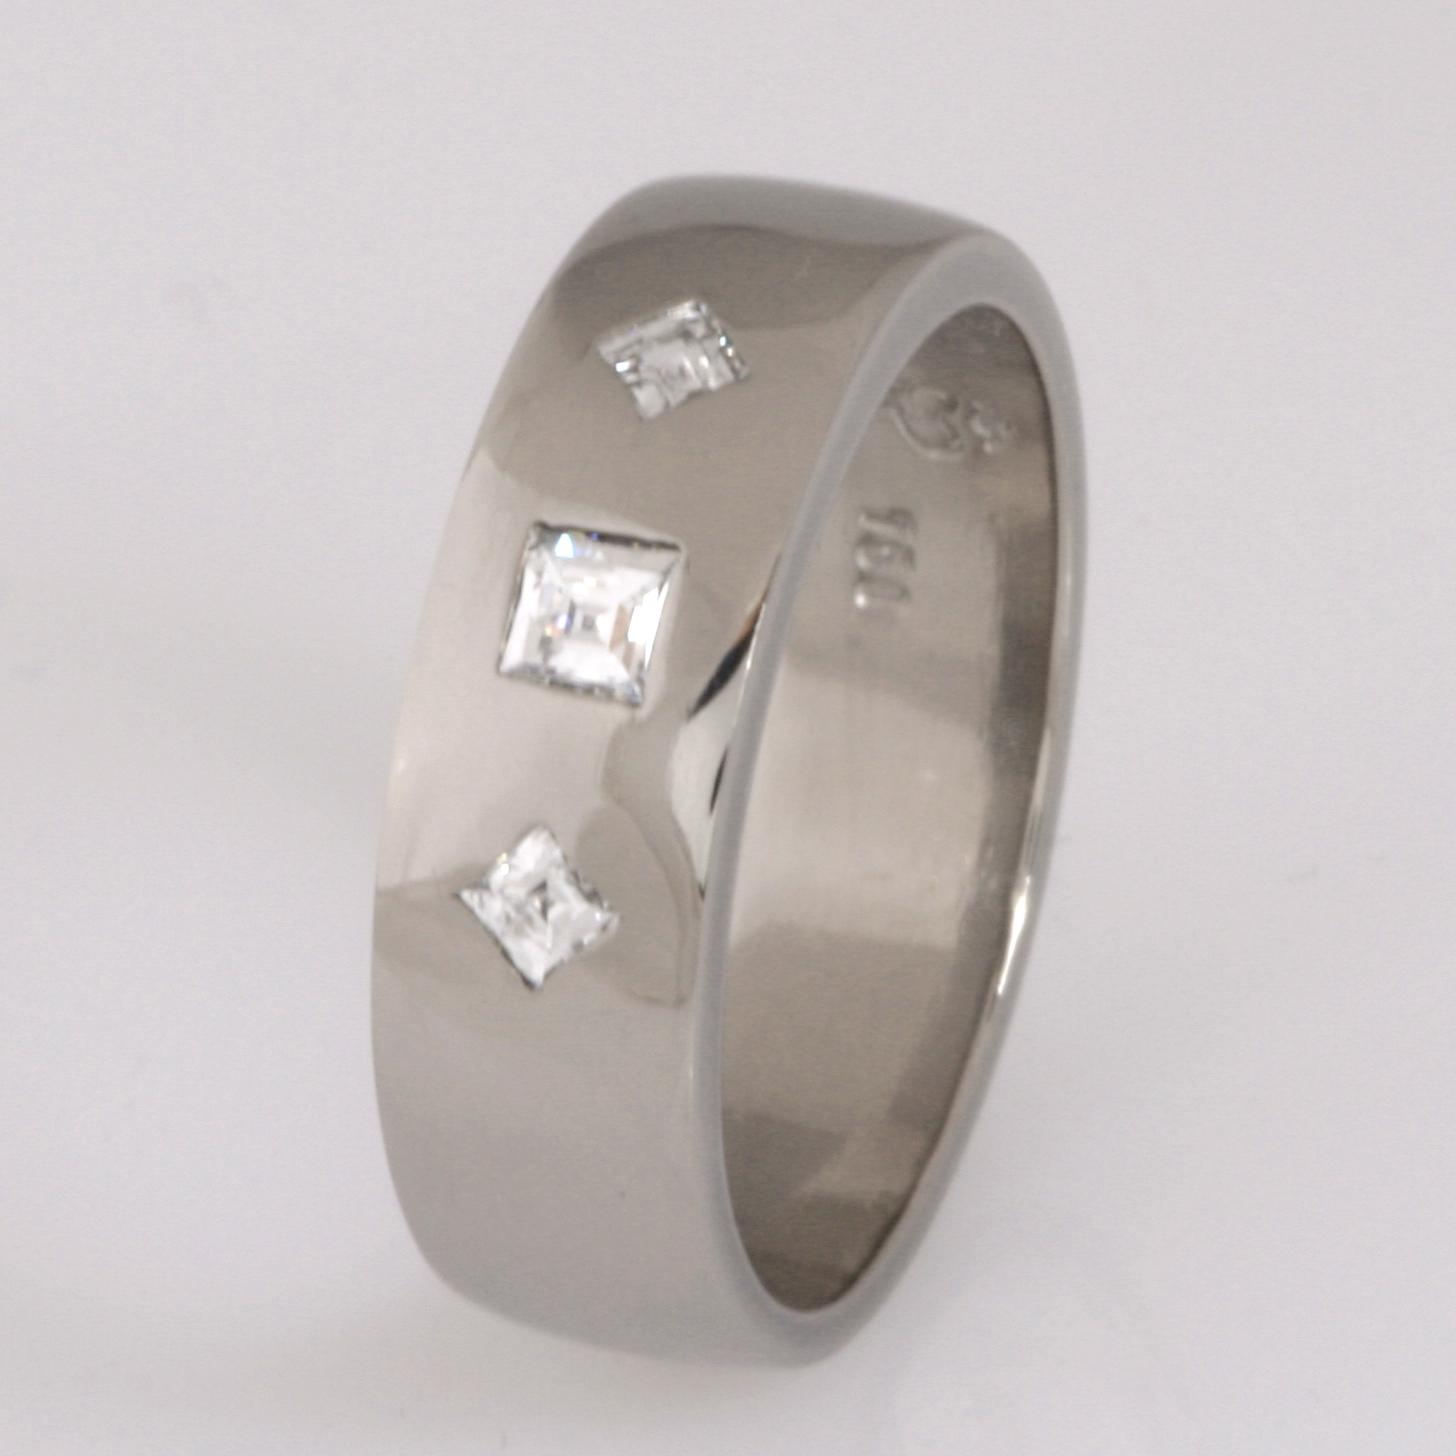 Handmade ladies18ct white gold 'Tycoon' cut diamond wedding ring